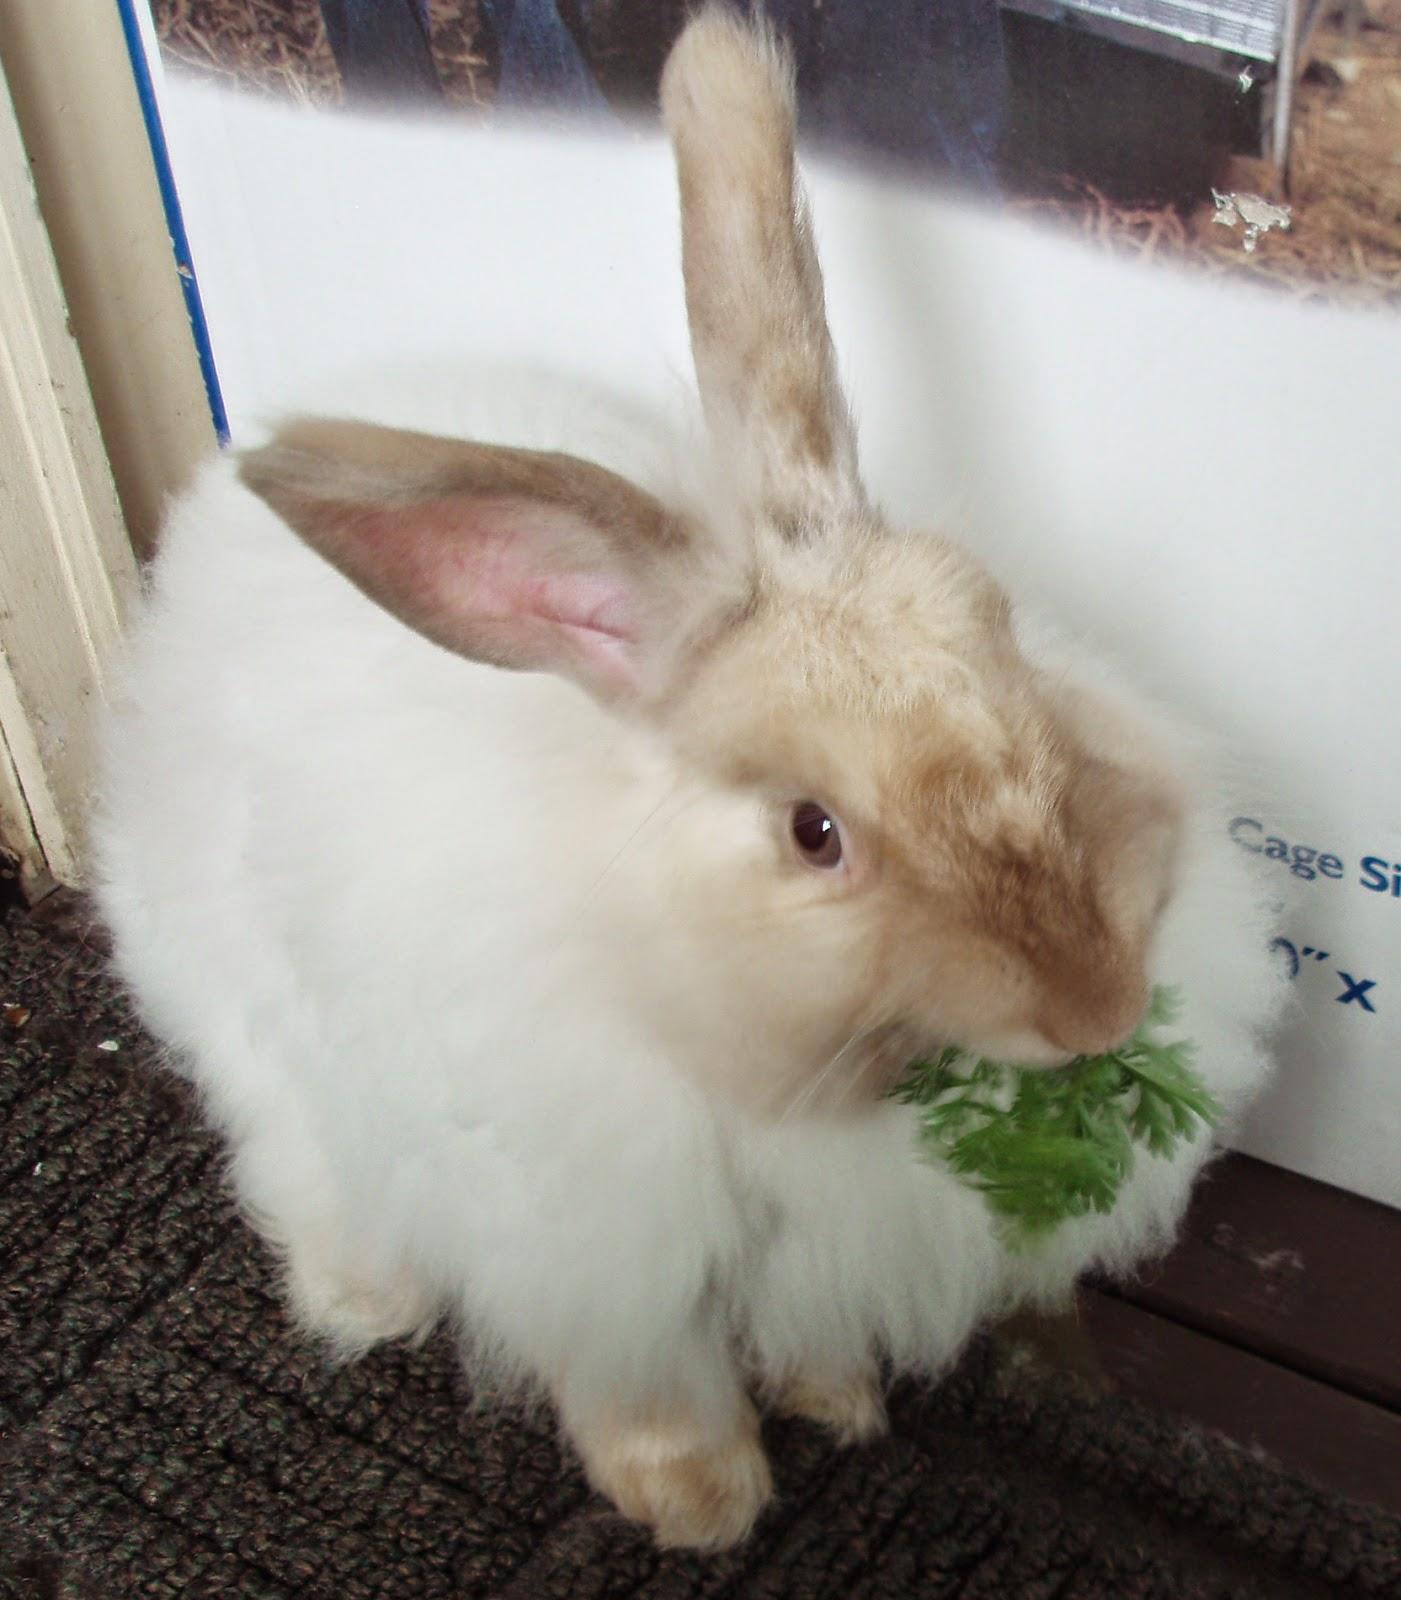 merawat kelinci aggora, foto kelinci anggora putih